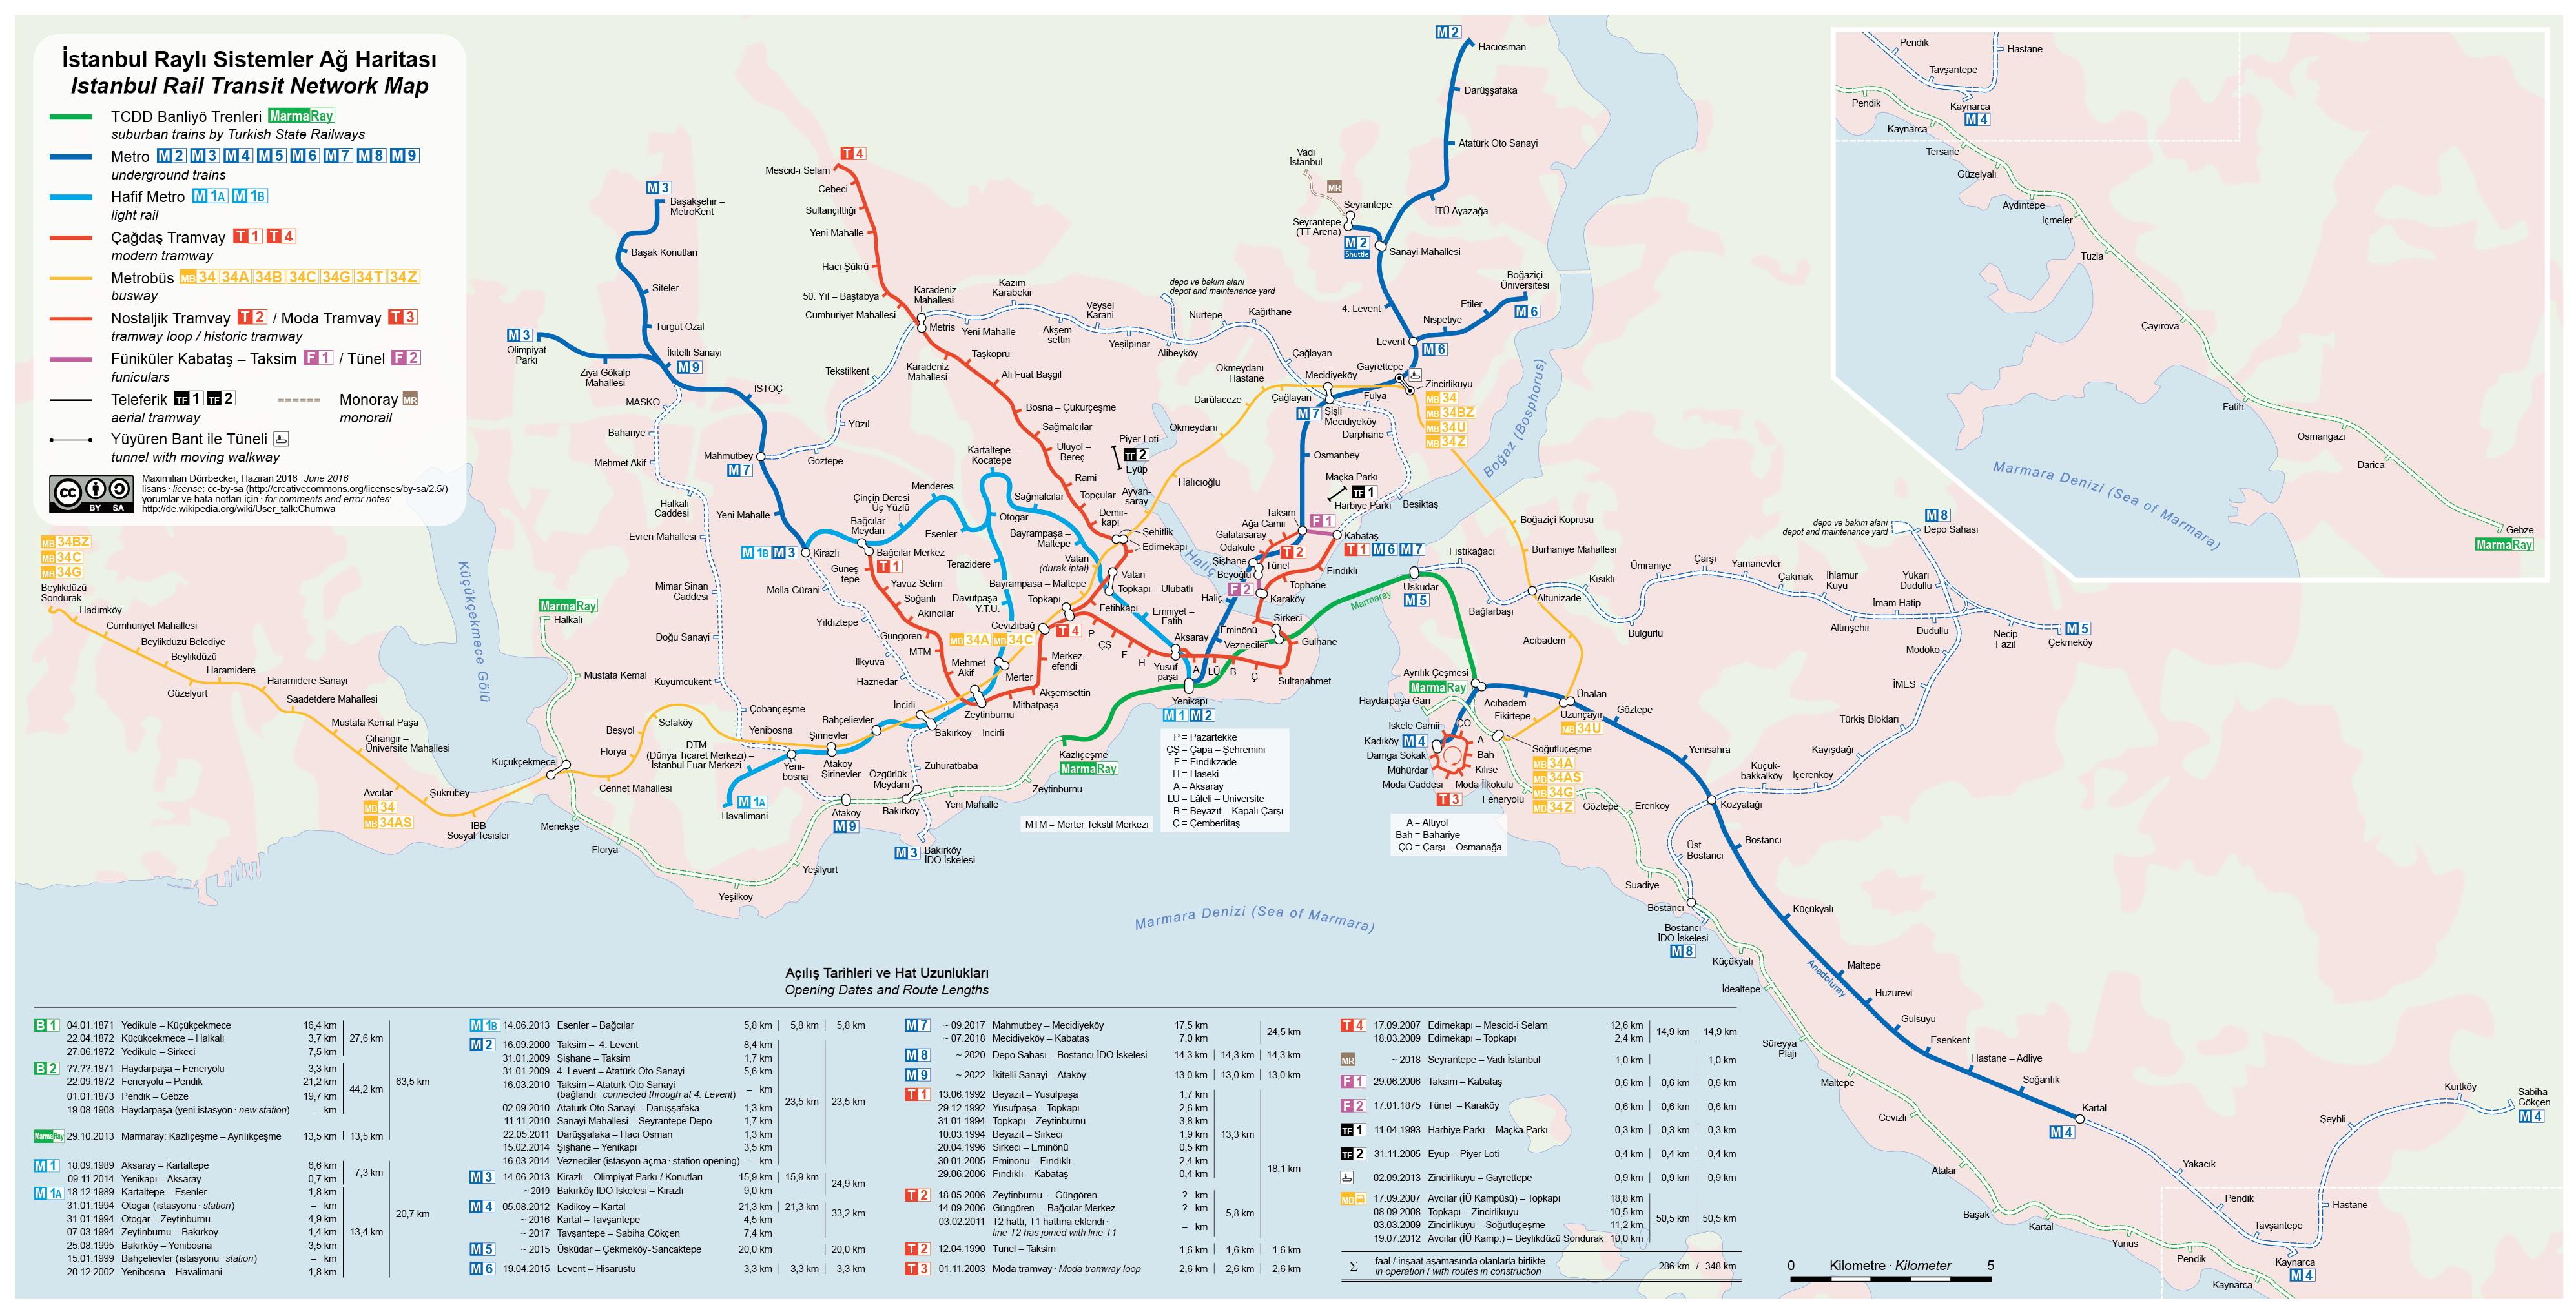 Схема транспорта Стамбула